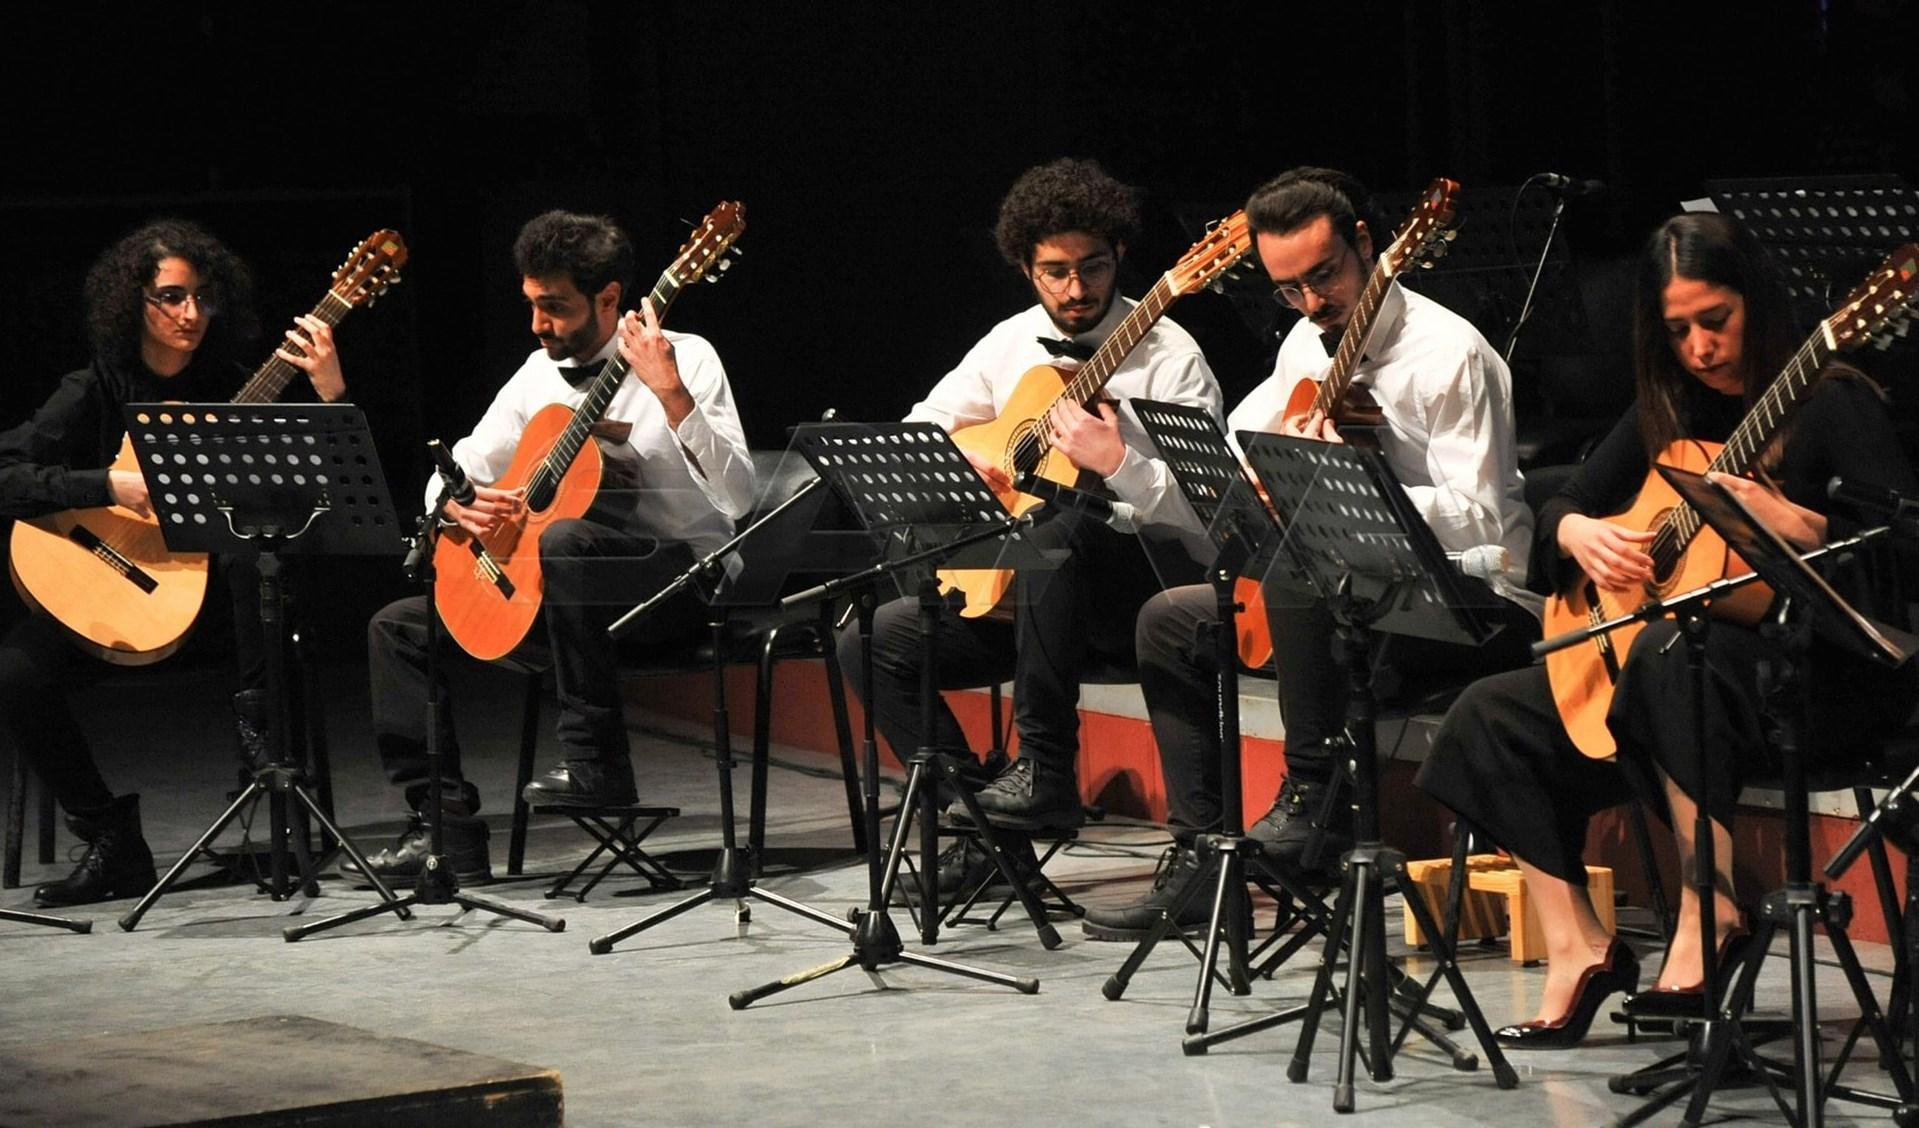 موسيقيو سوريا يحتفلون بذكرى تأسيس